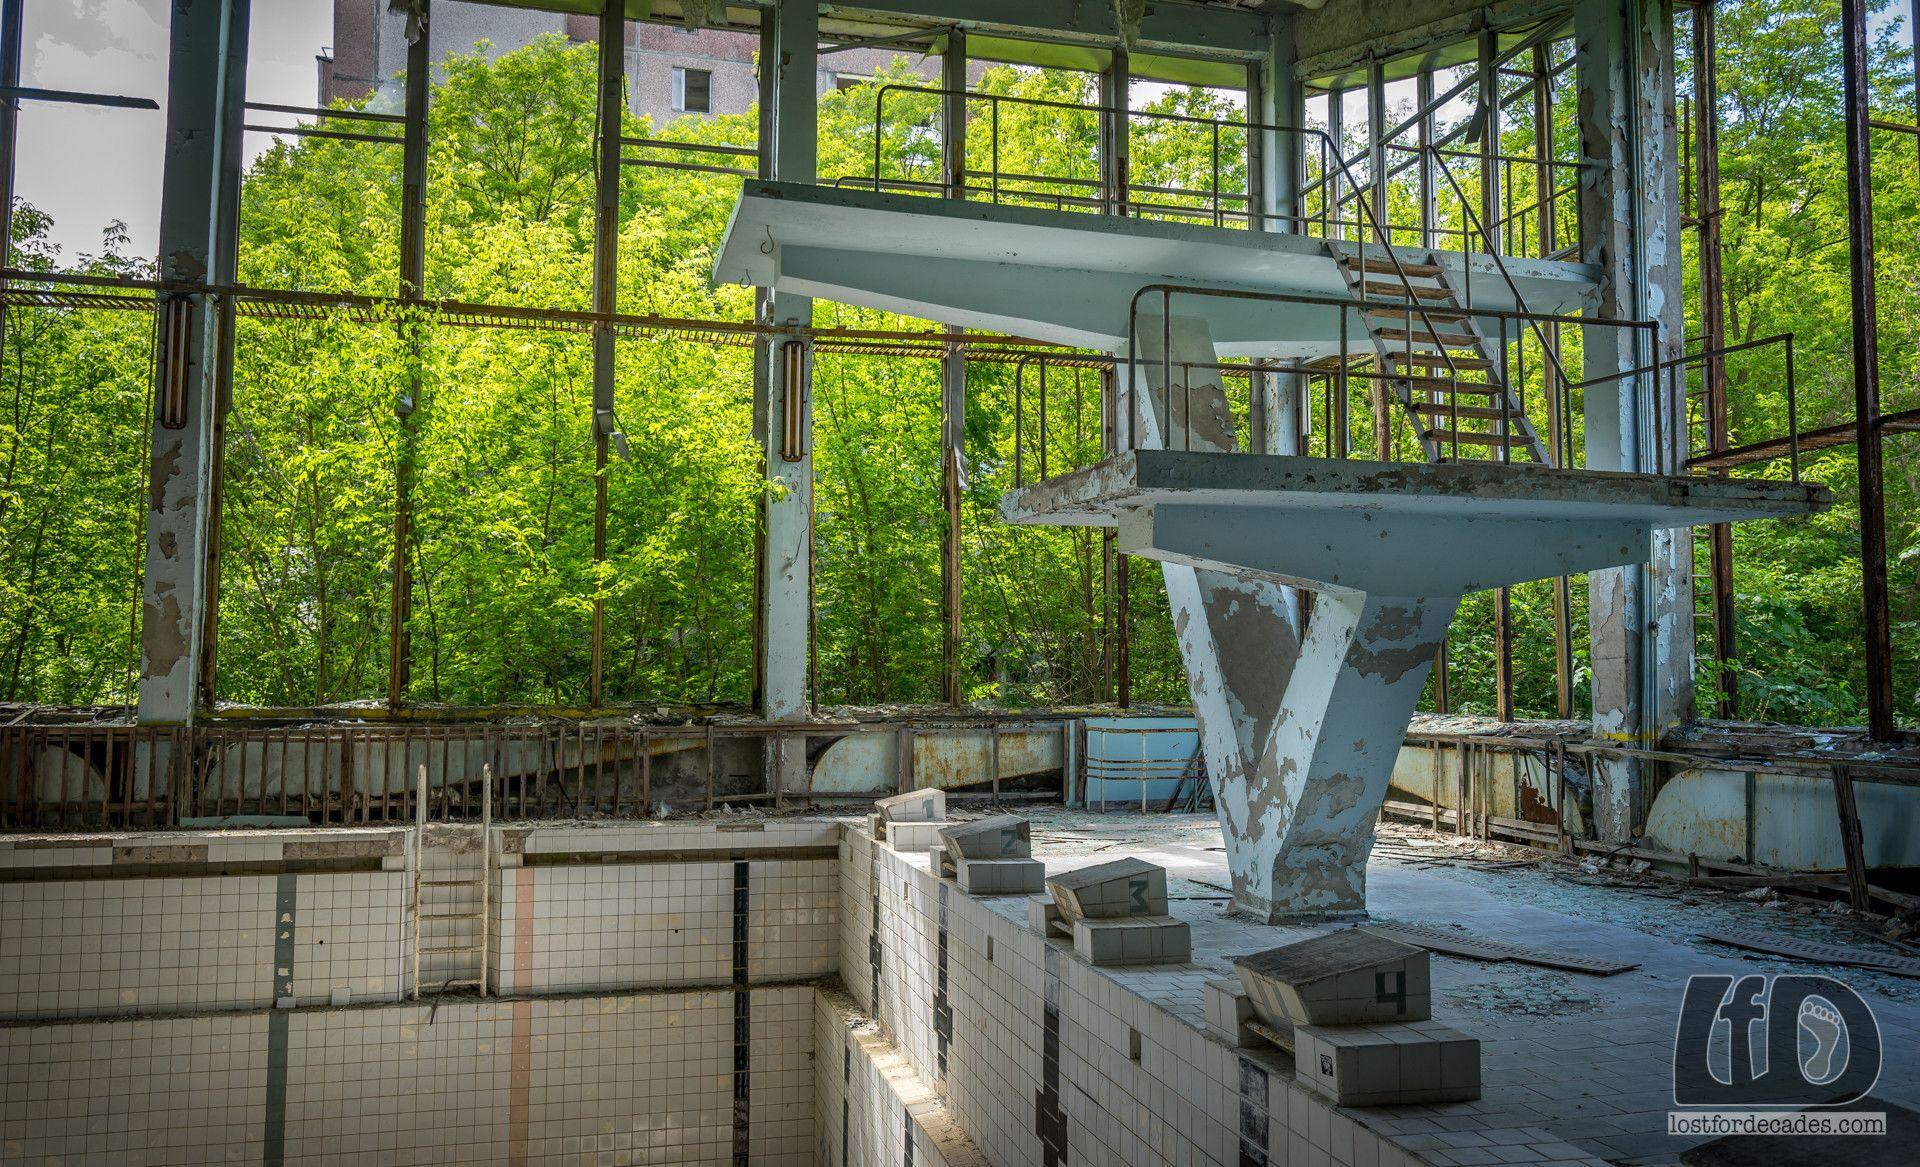 Chernobyl Lostfordecades Com 37 Jpg Luoghi 26 Aprile